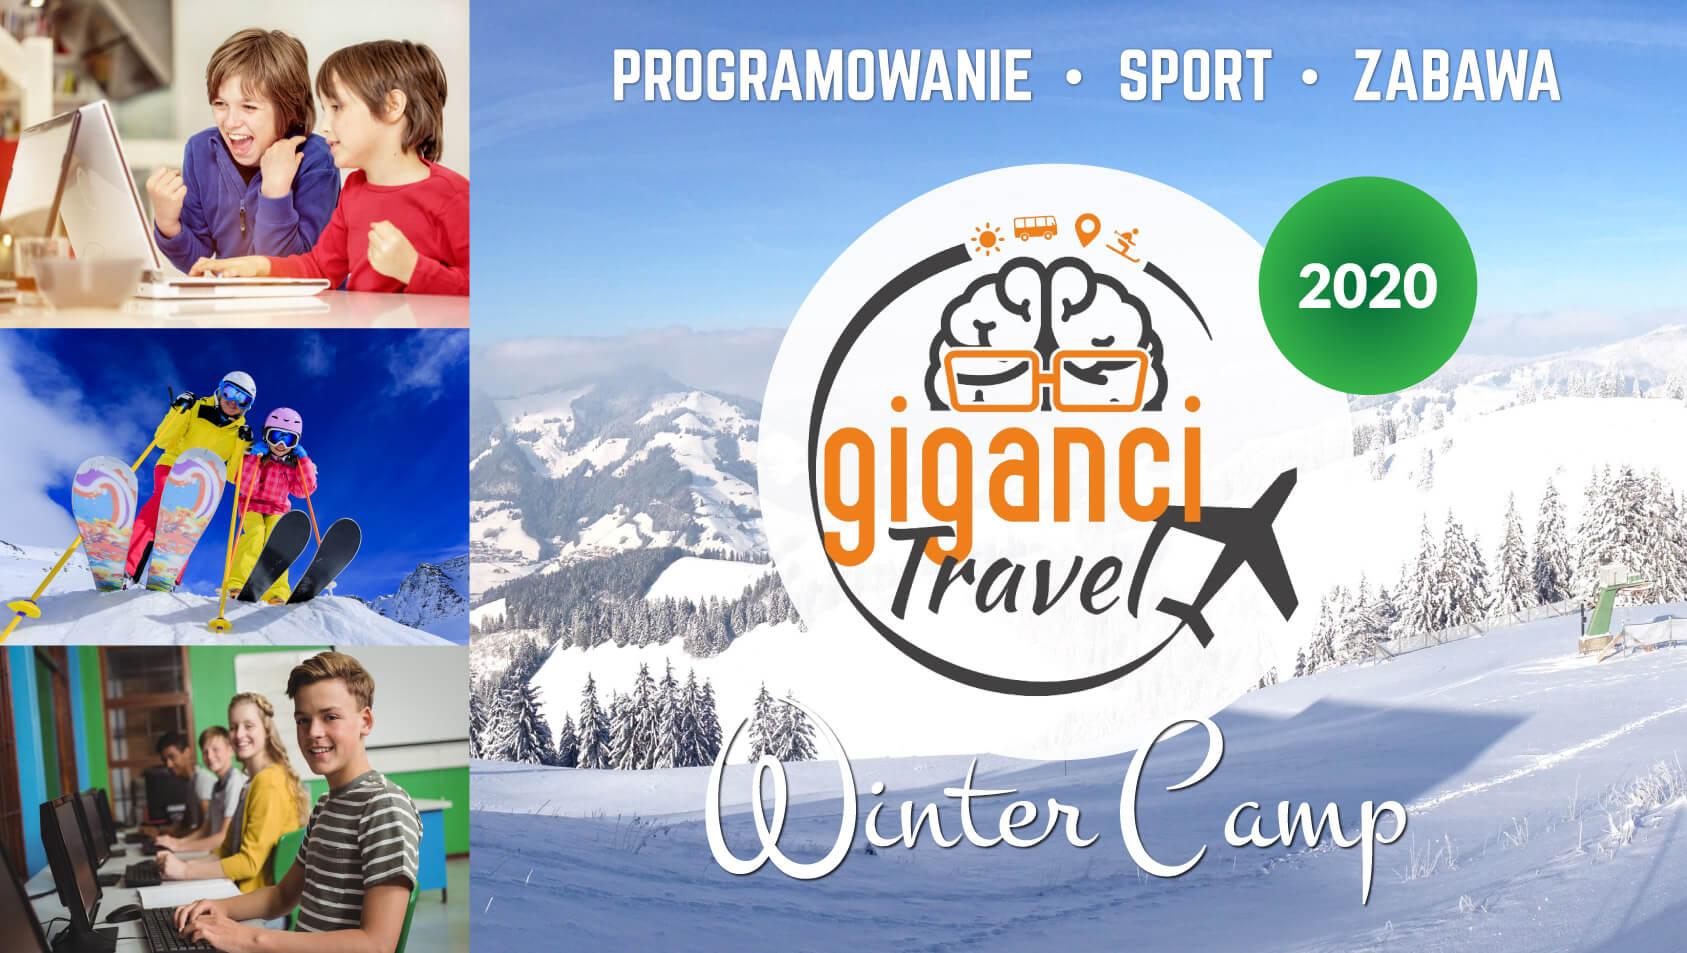 travel-winter-2020